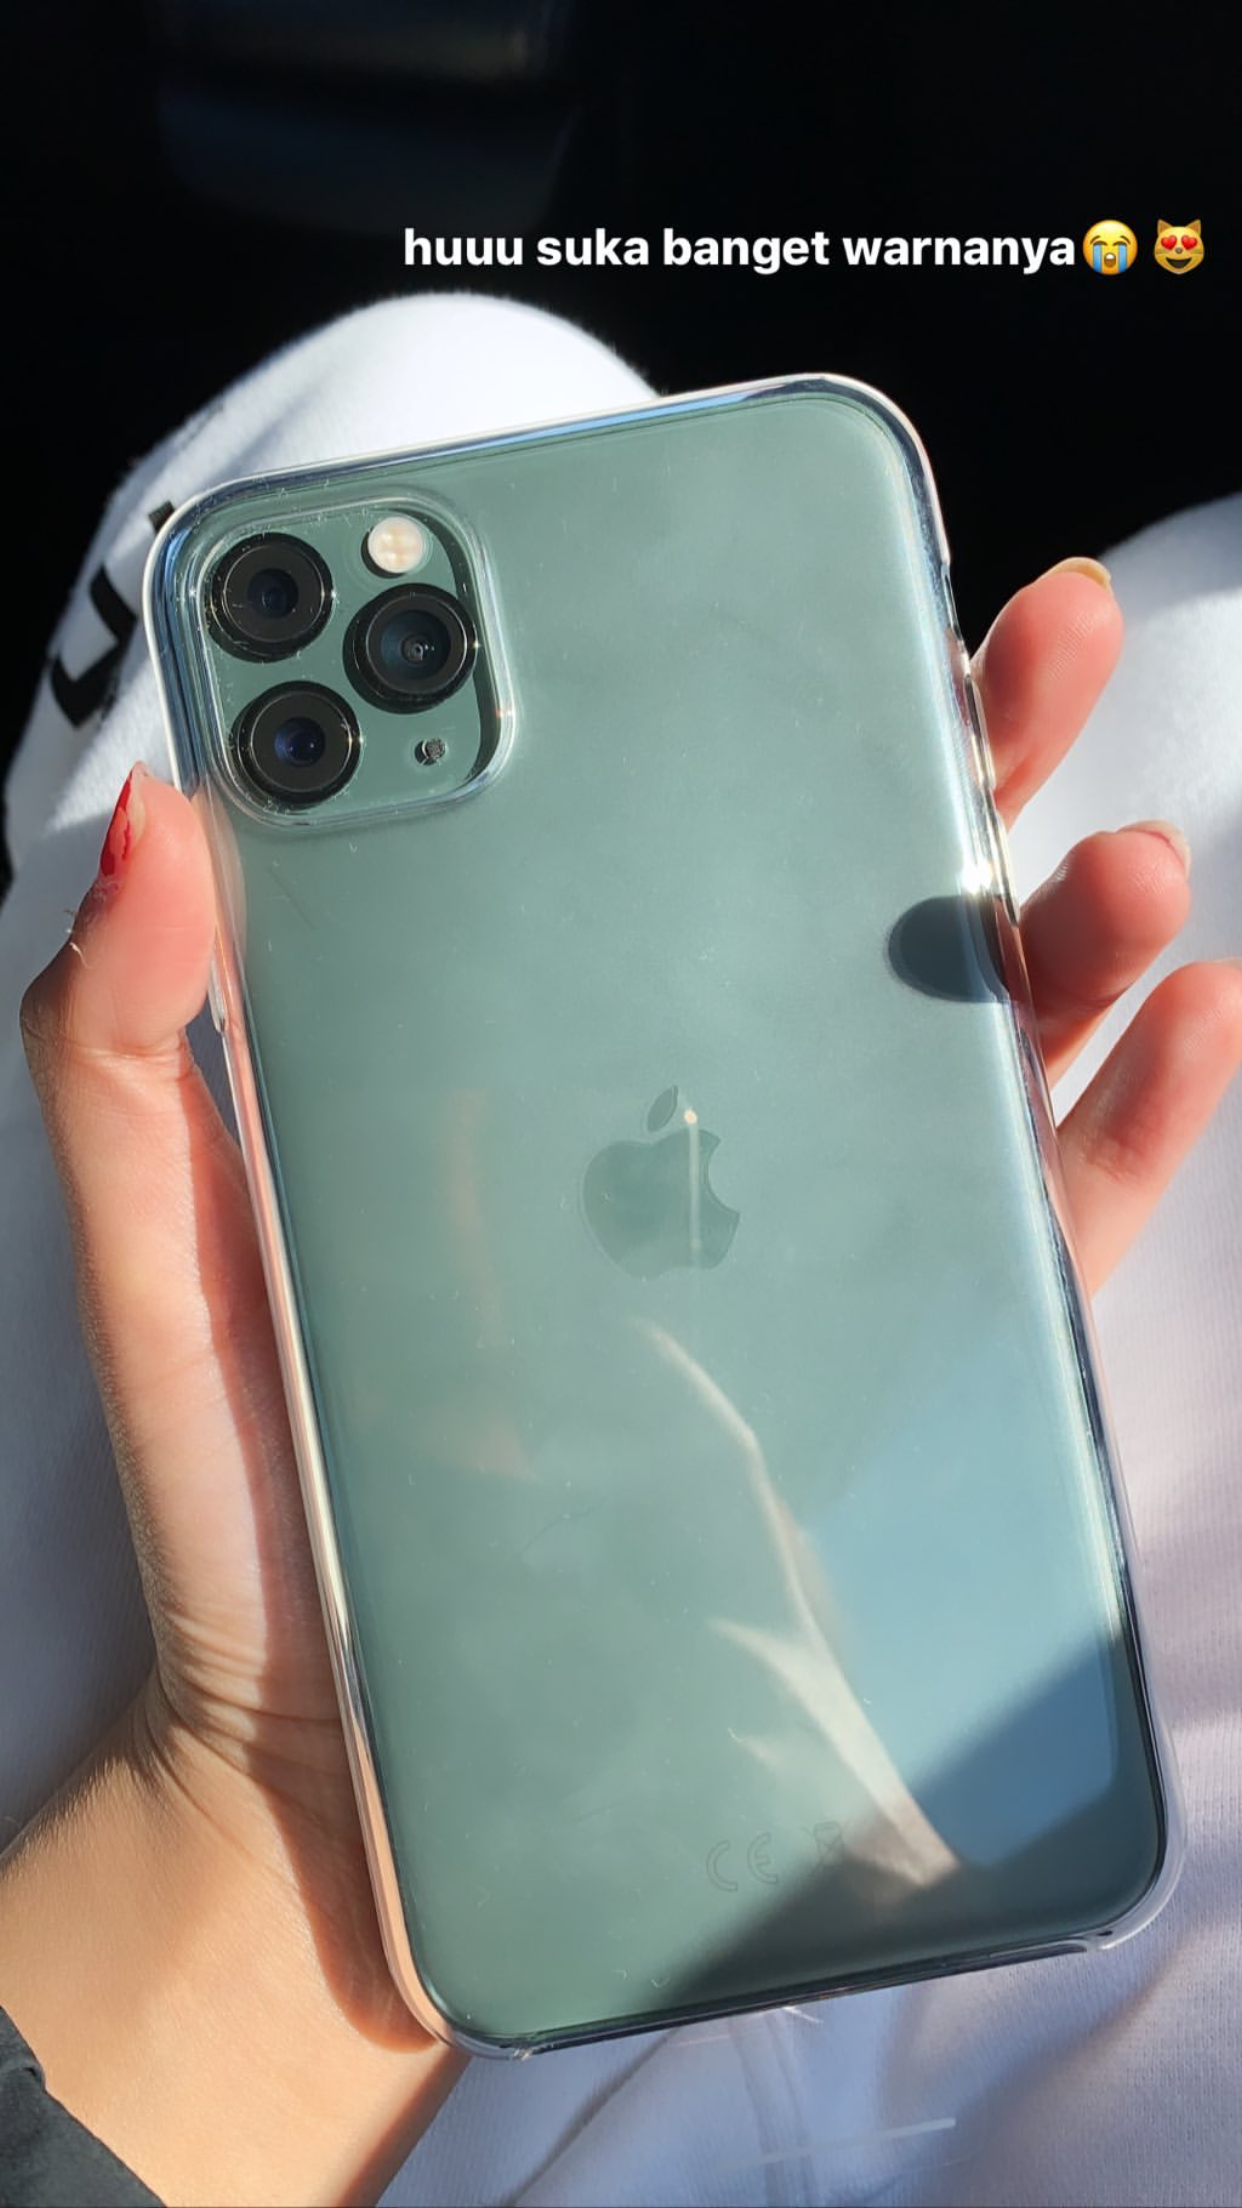 Pin Oleh Lana Di Apple Aksesoris Fotografi Dan Foto Diri Sendiri